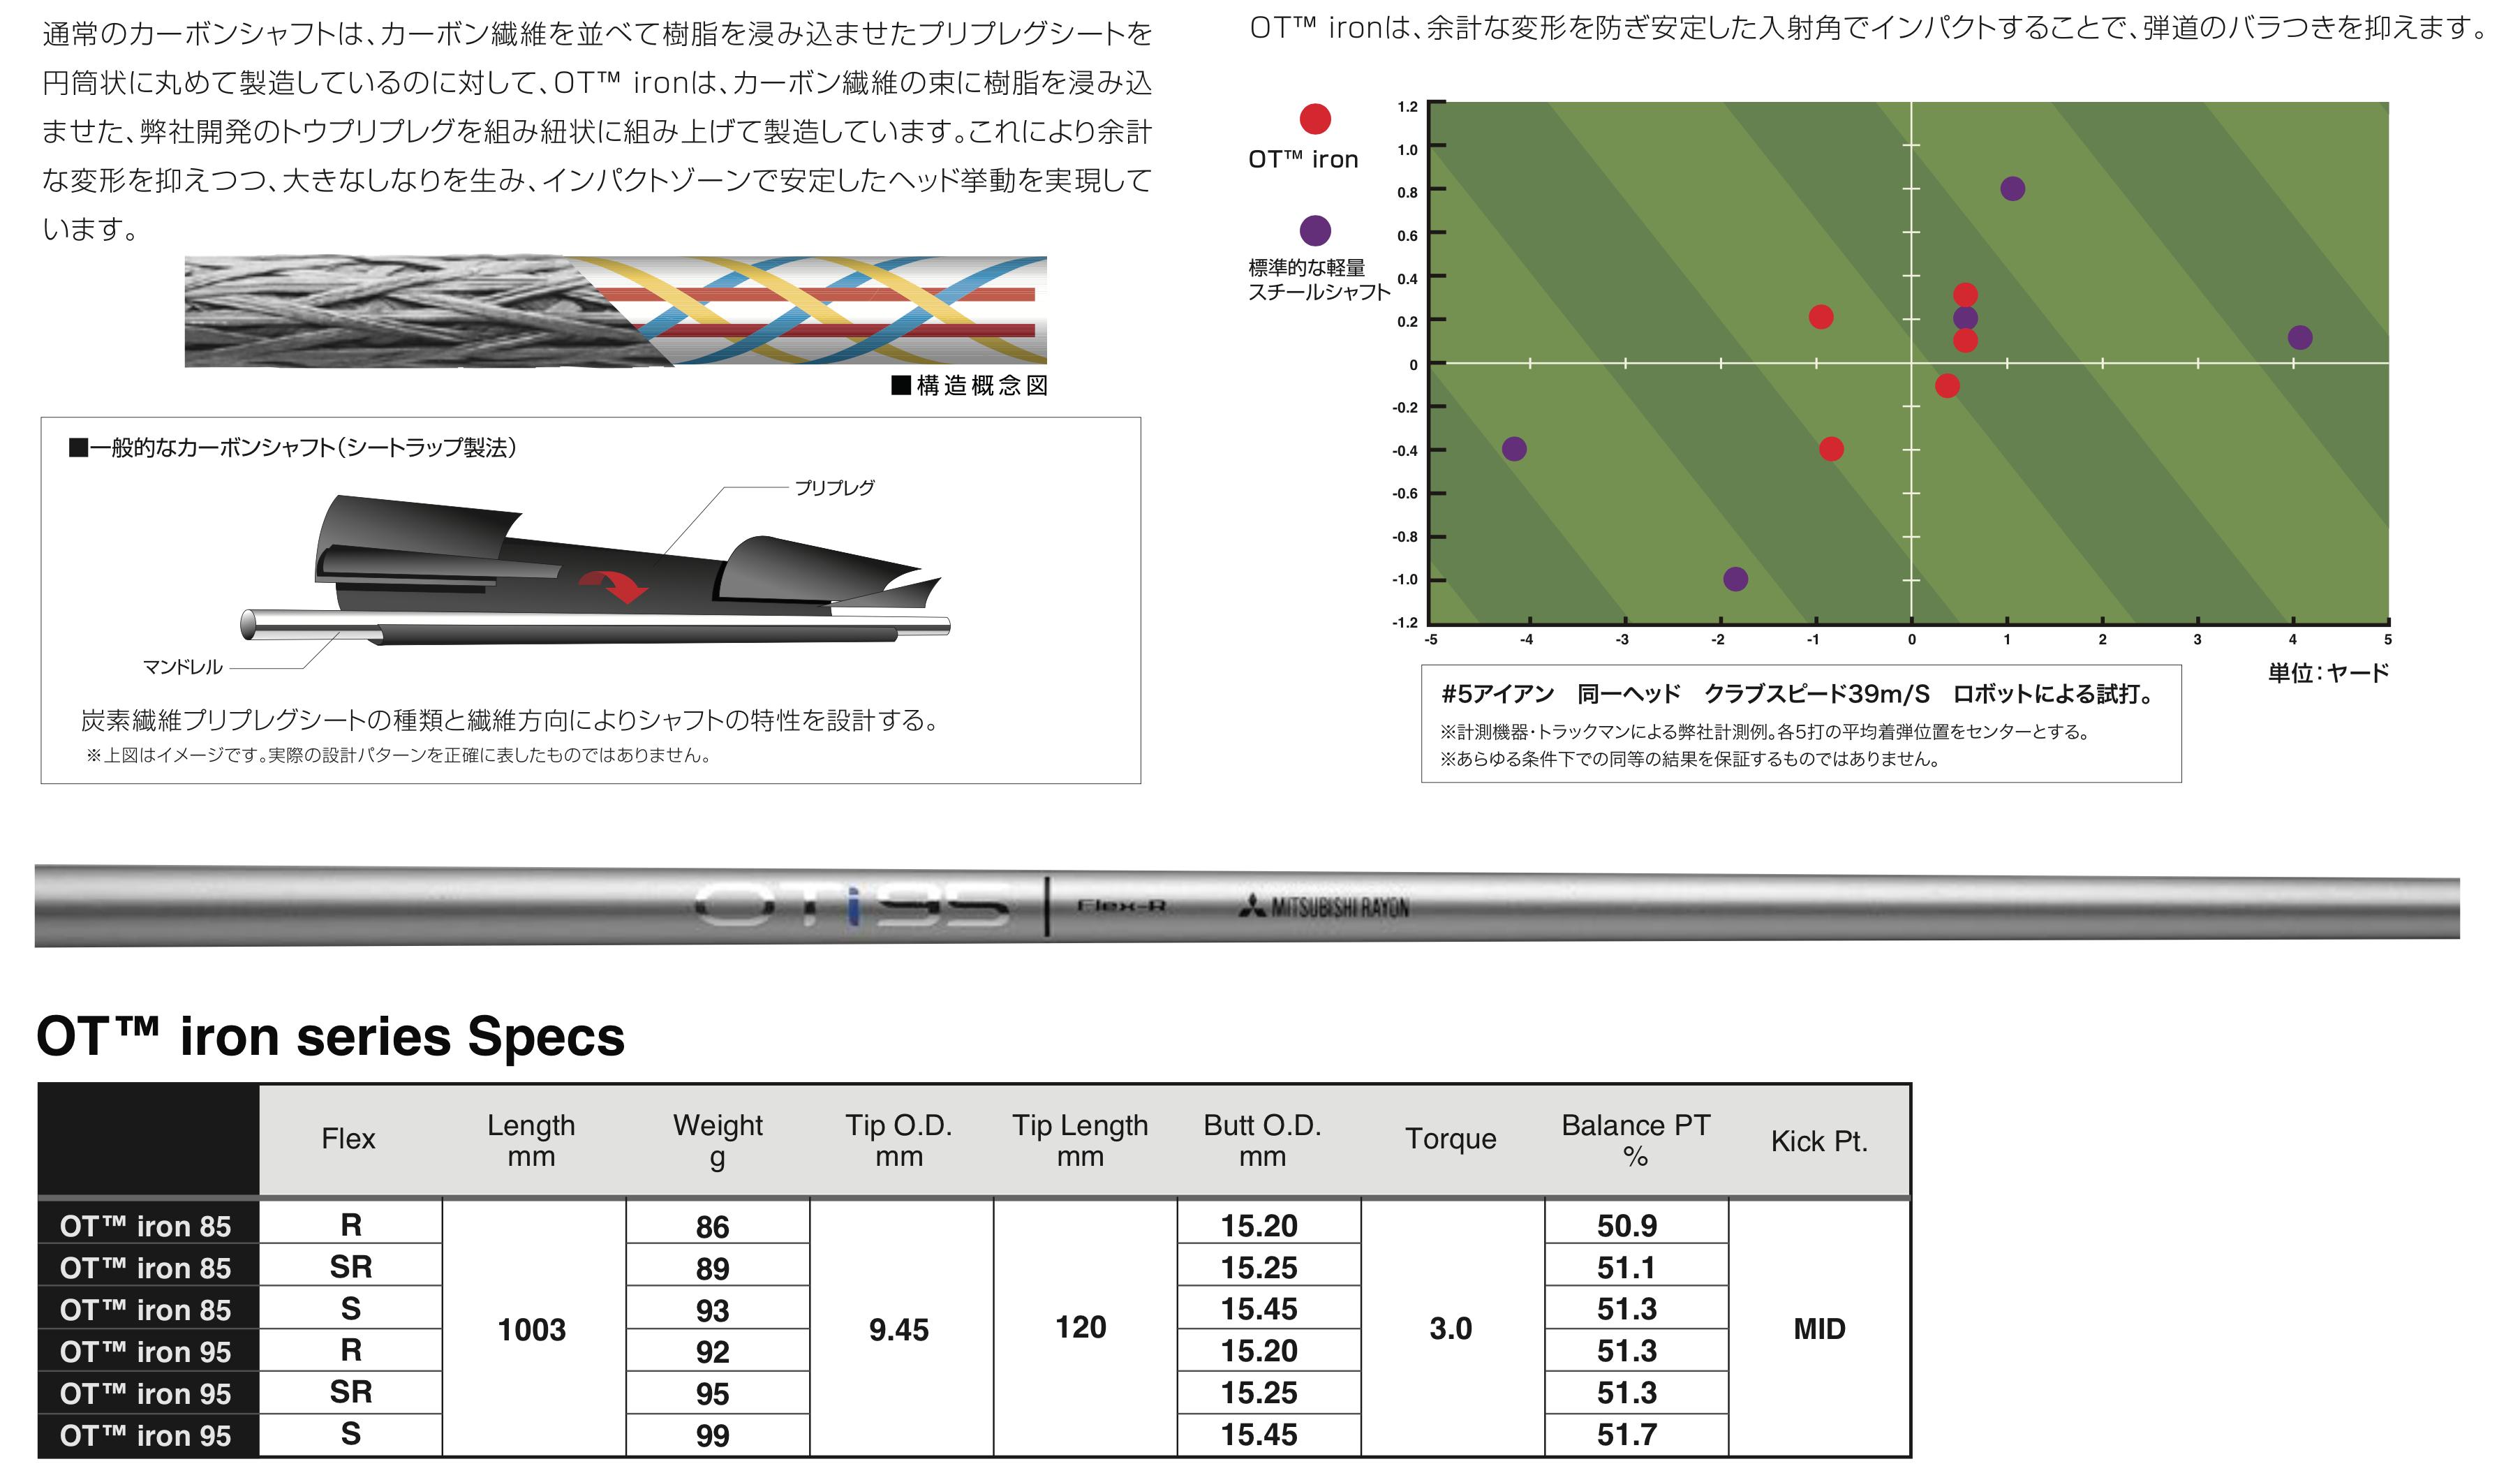 Mitsubishi OT Iron Shaft